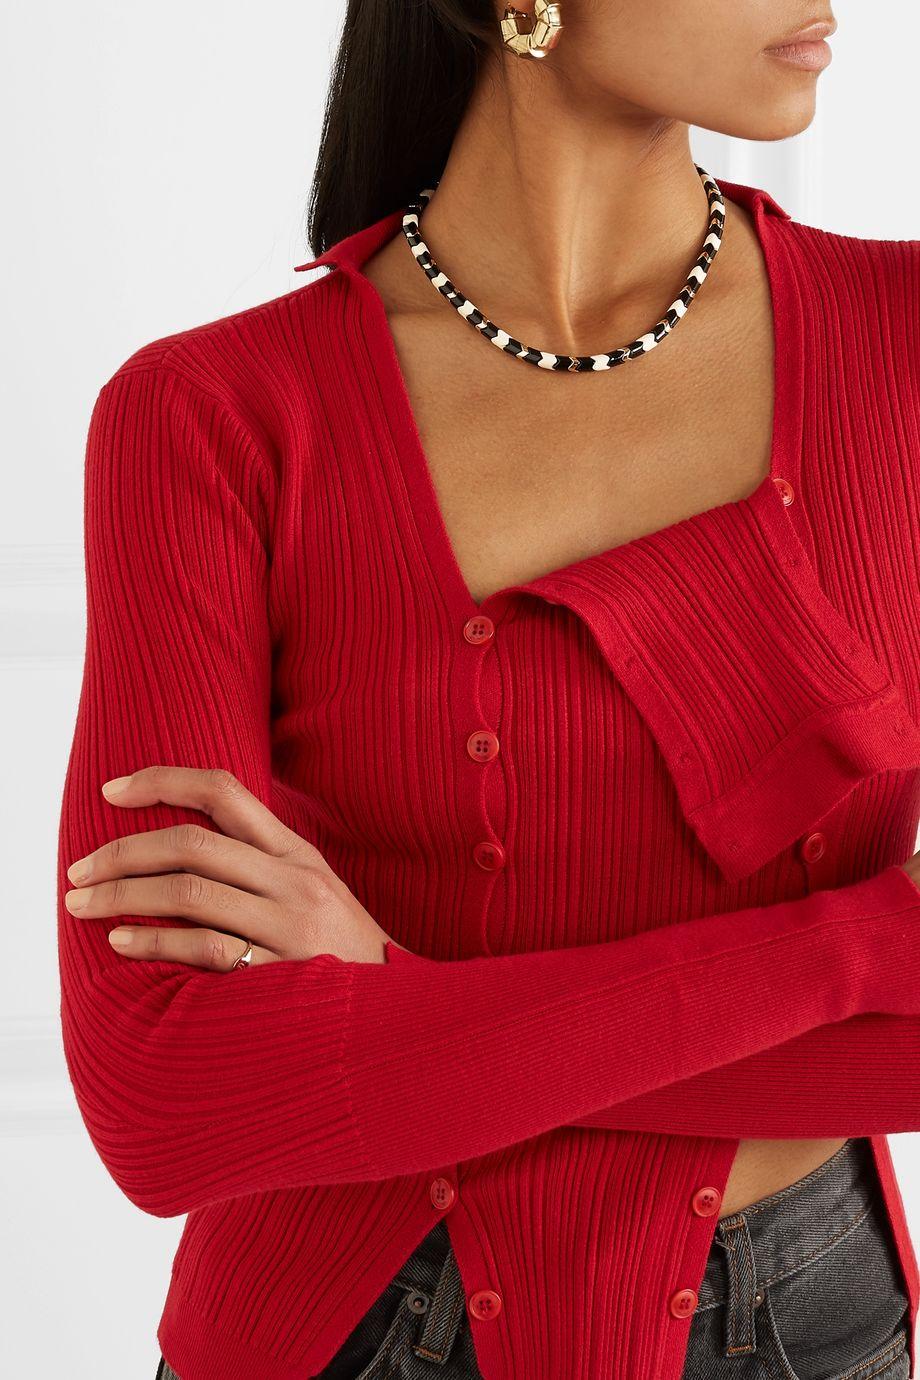 Roxanne Assoulin Suit Yourself 搪瓷金色项链